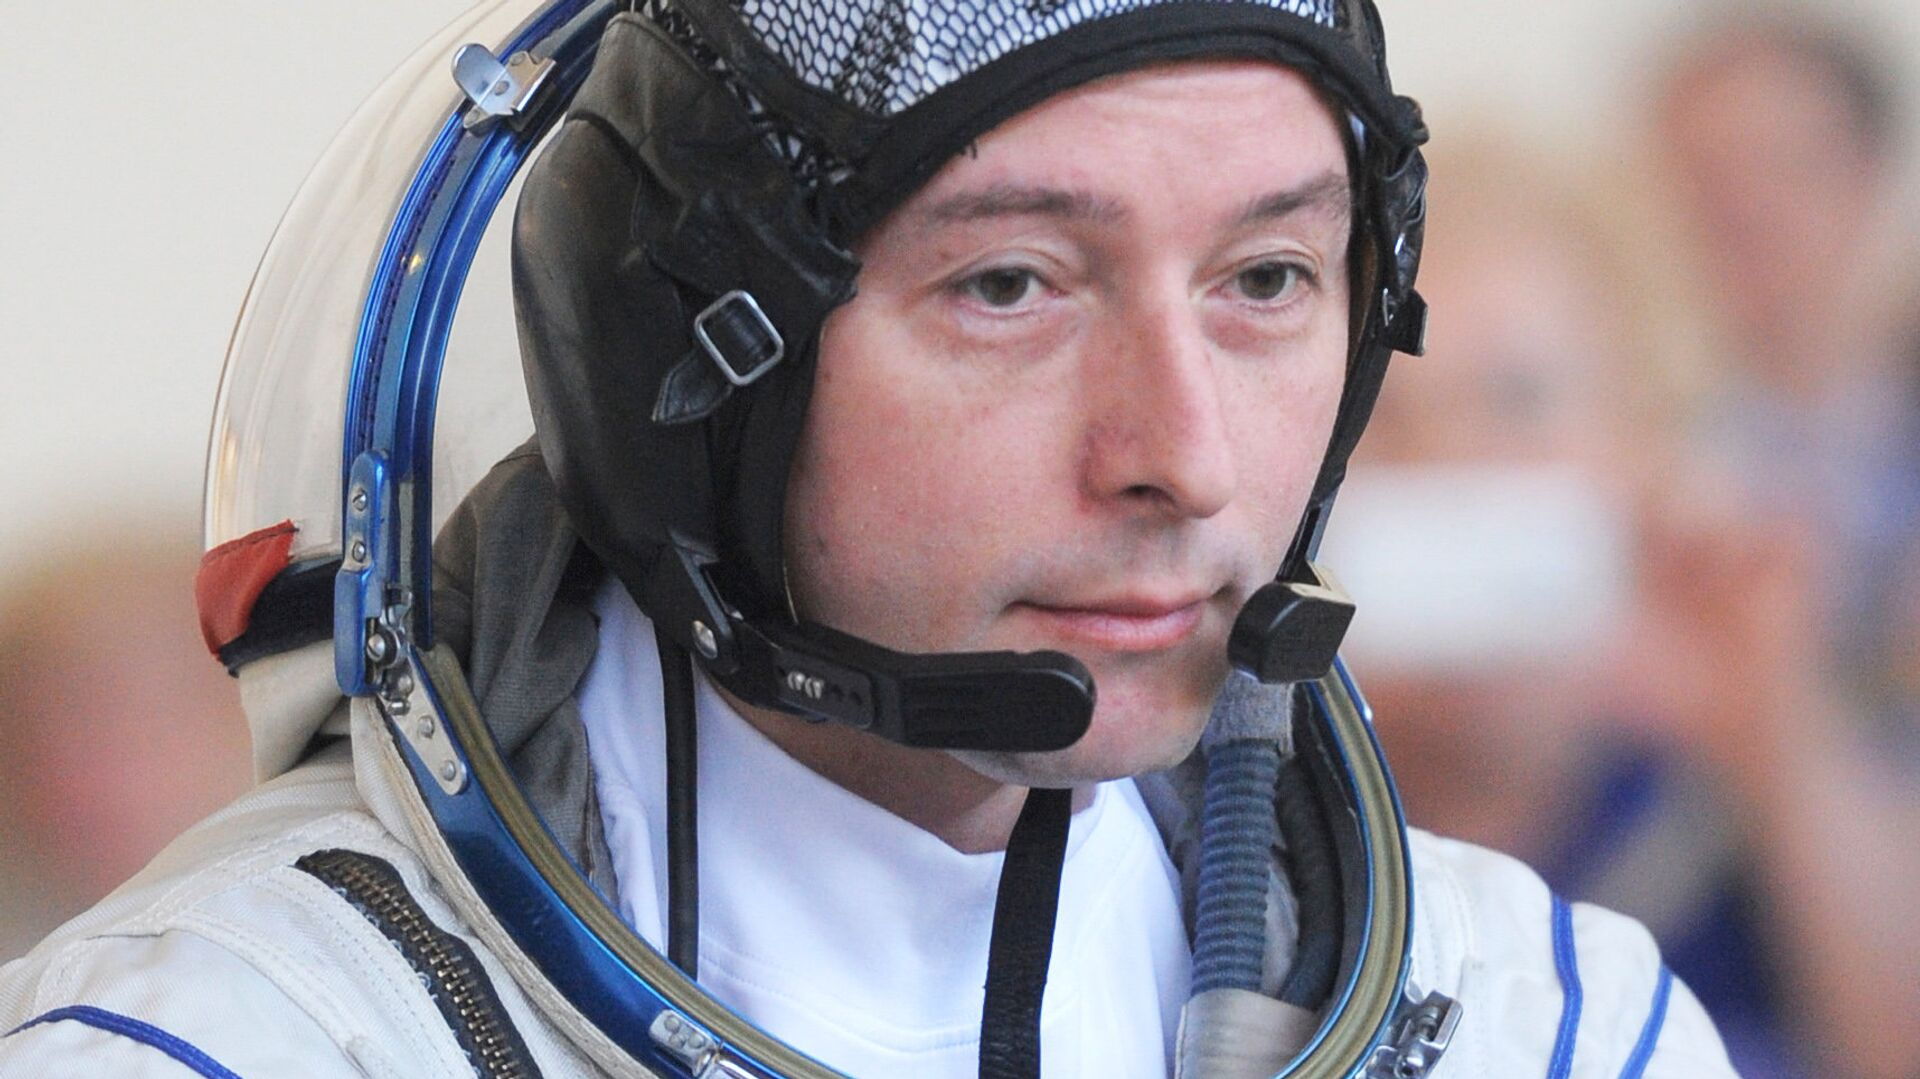 El cosmonauta ruso Serguéi Revin - Sputnik Mundo, 1920, 09.04.2021